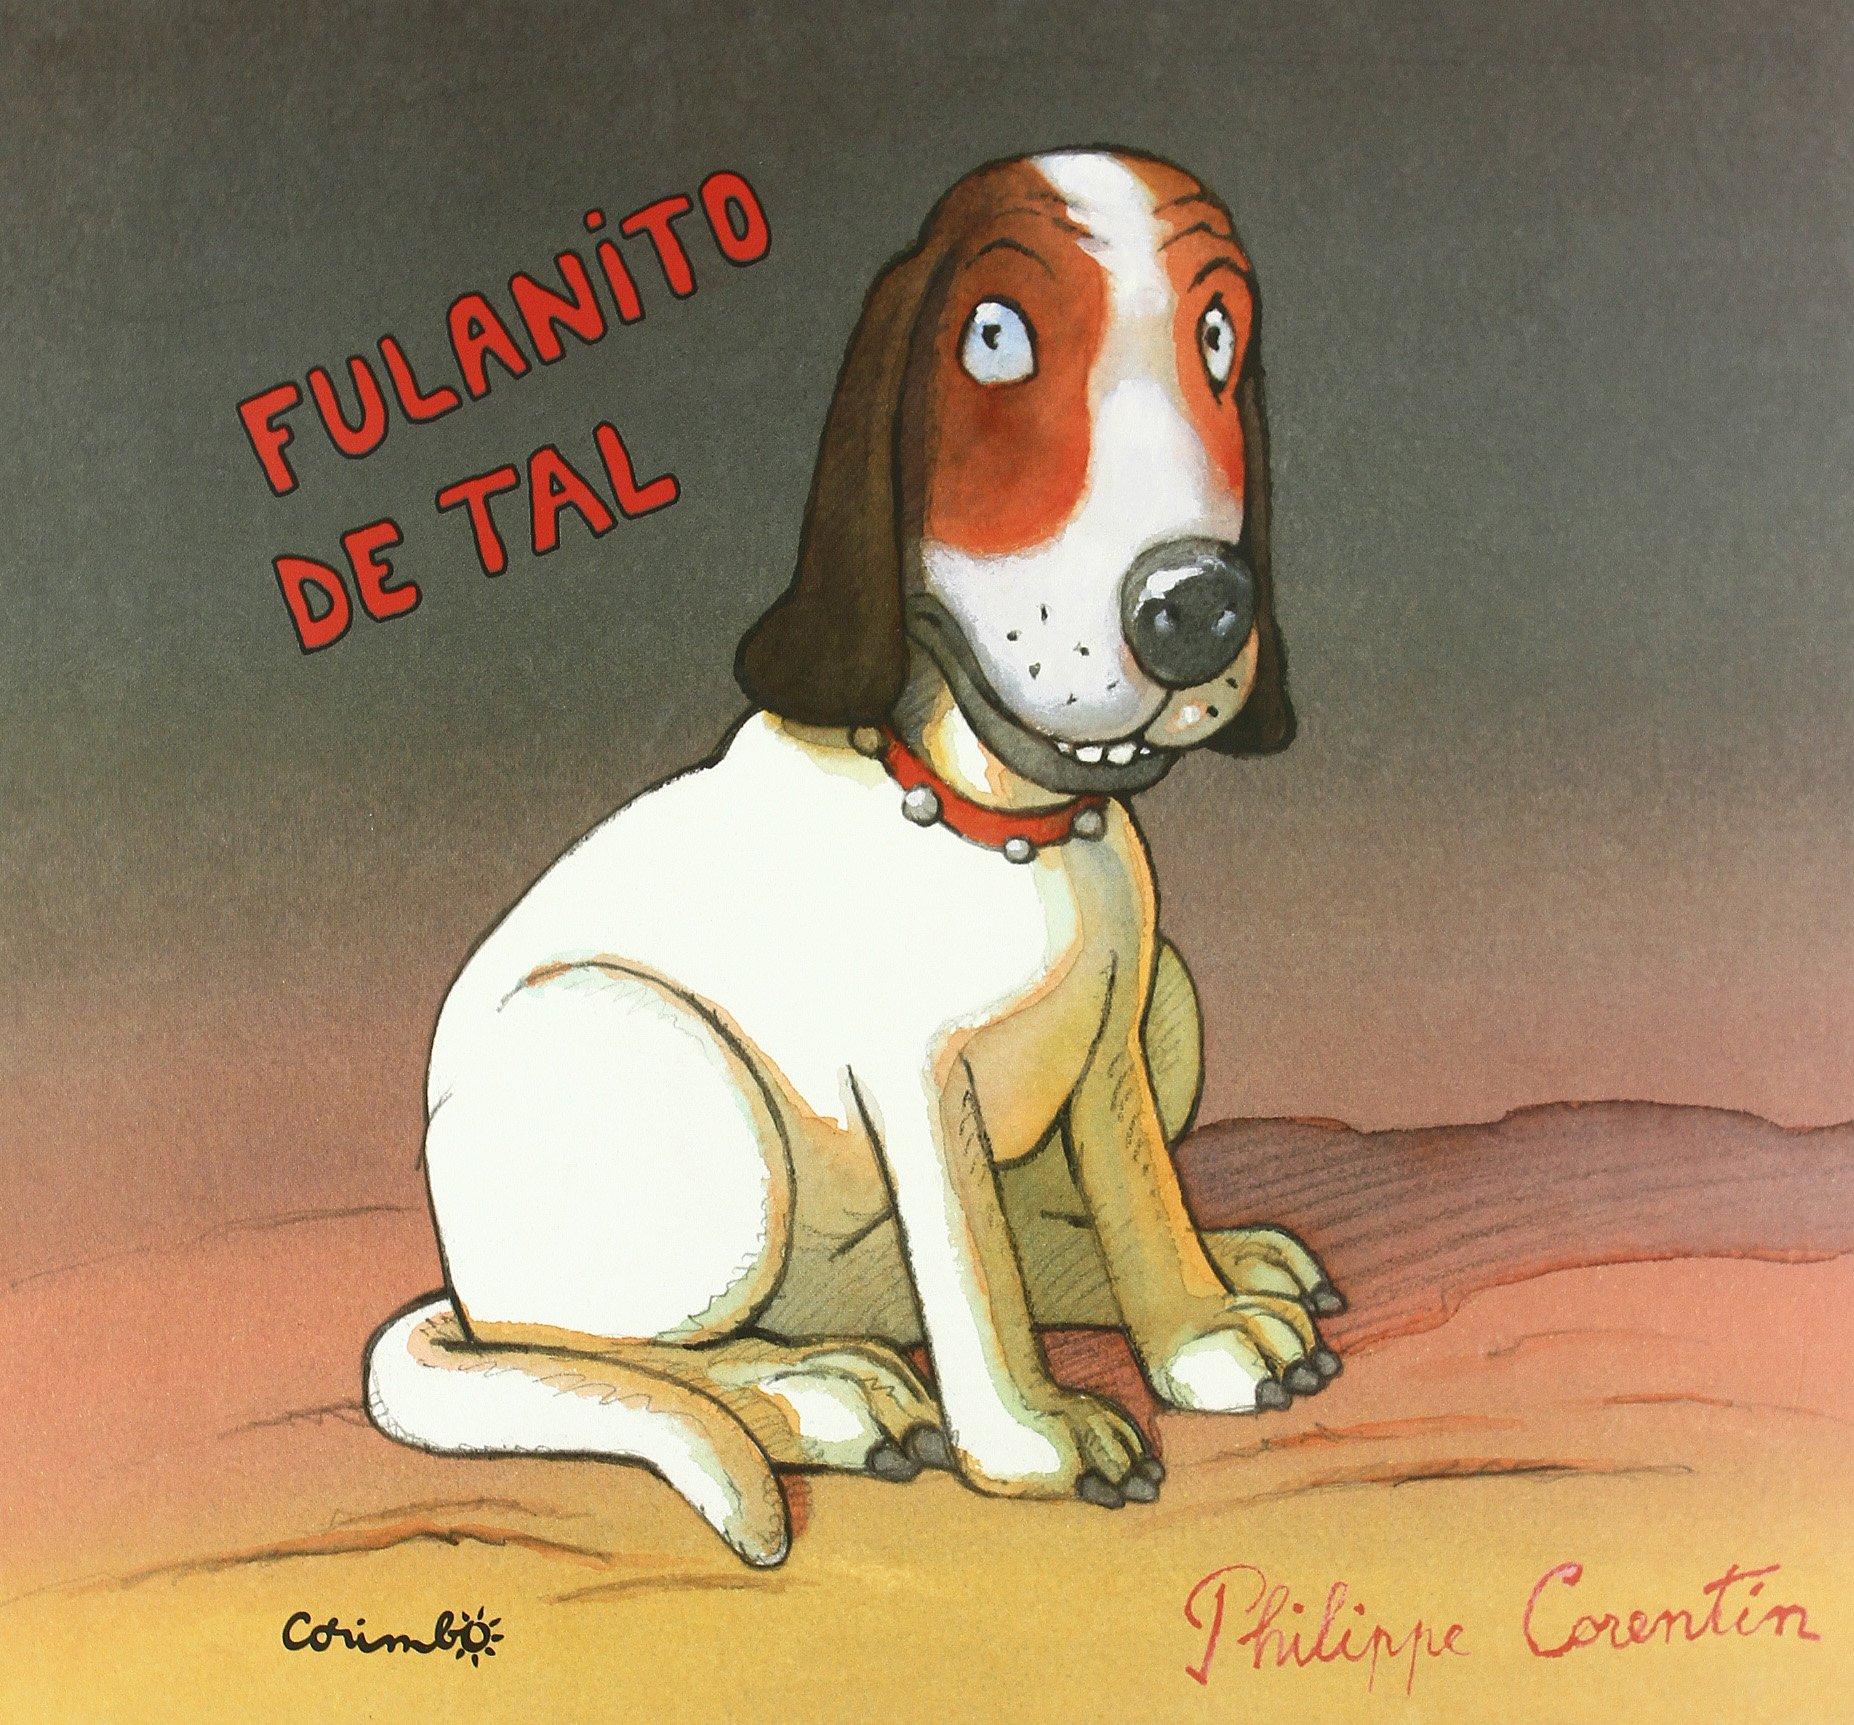 Download Fulanito de Tal / So and So (Spanish Edition) ebook